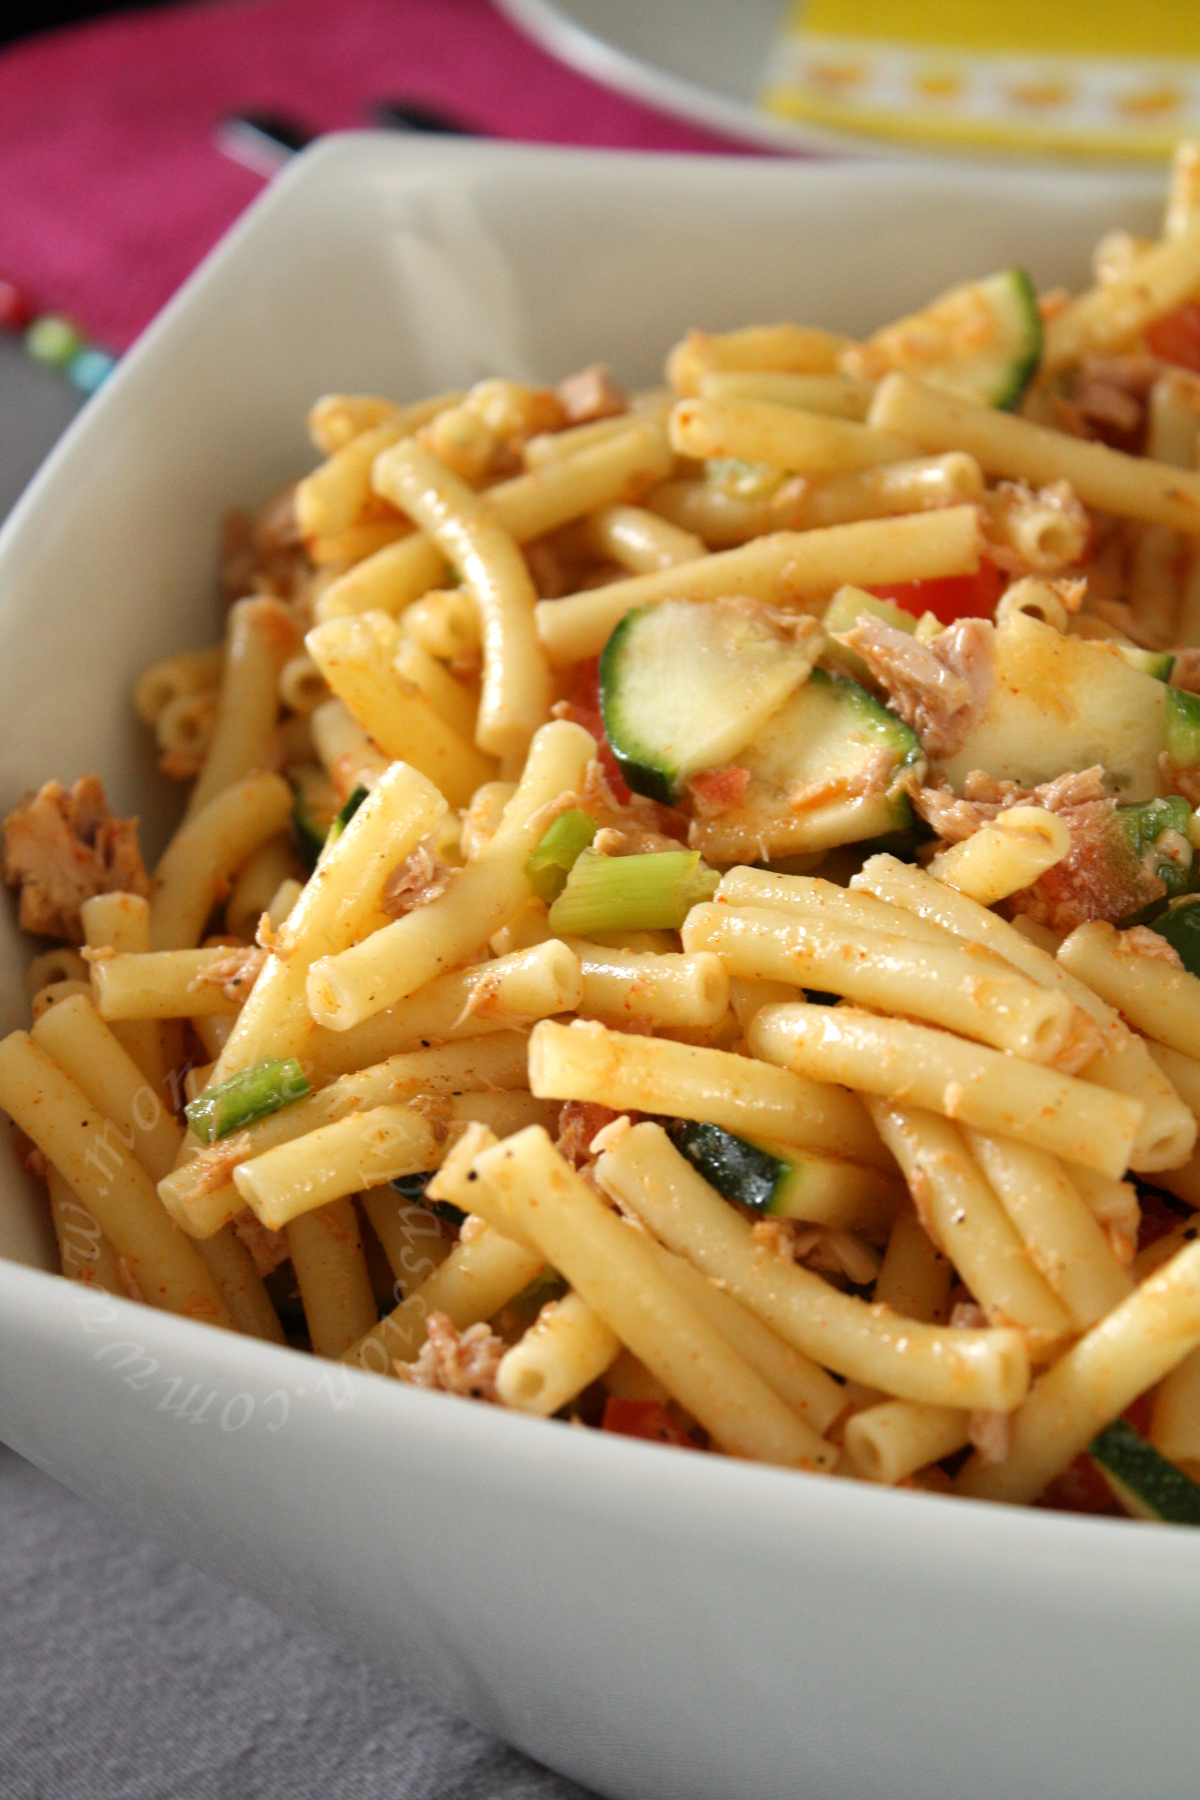 Salade de macaroni au thon – Macaroni tuna salad